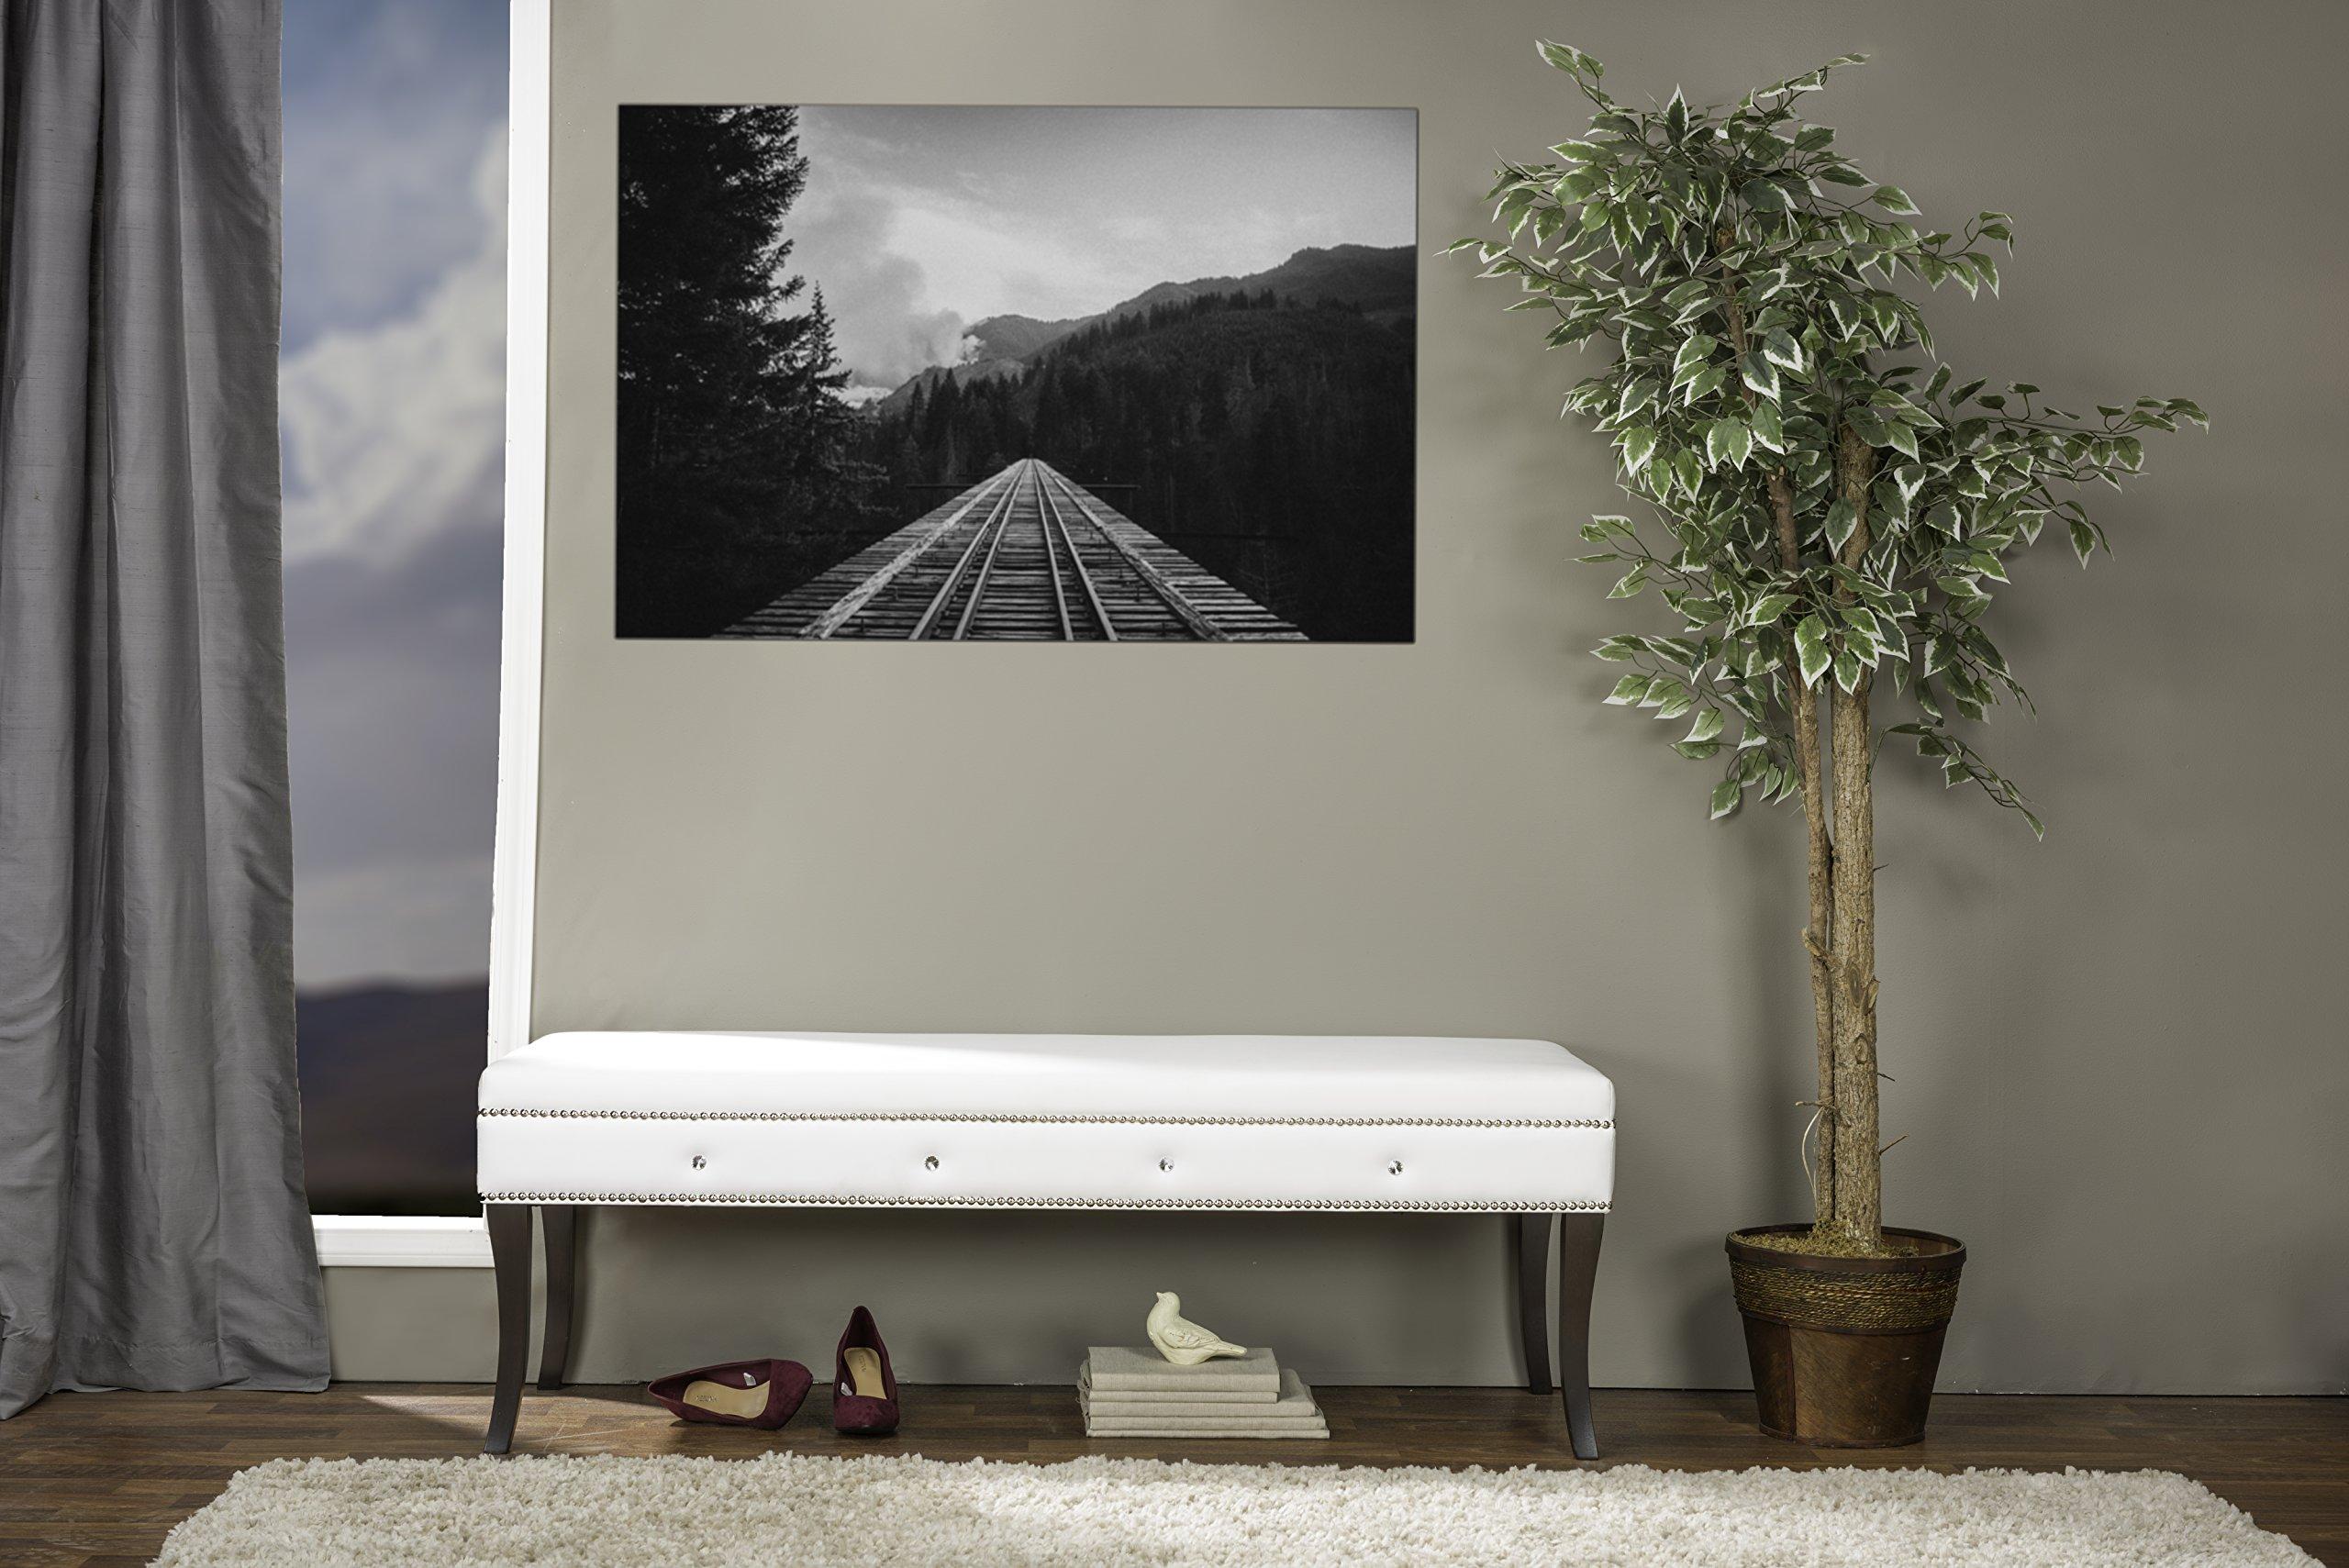 Baxton Studio Tavignano Wood and Leather Contemporary Bench, White